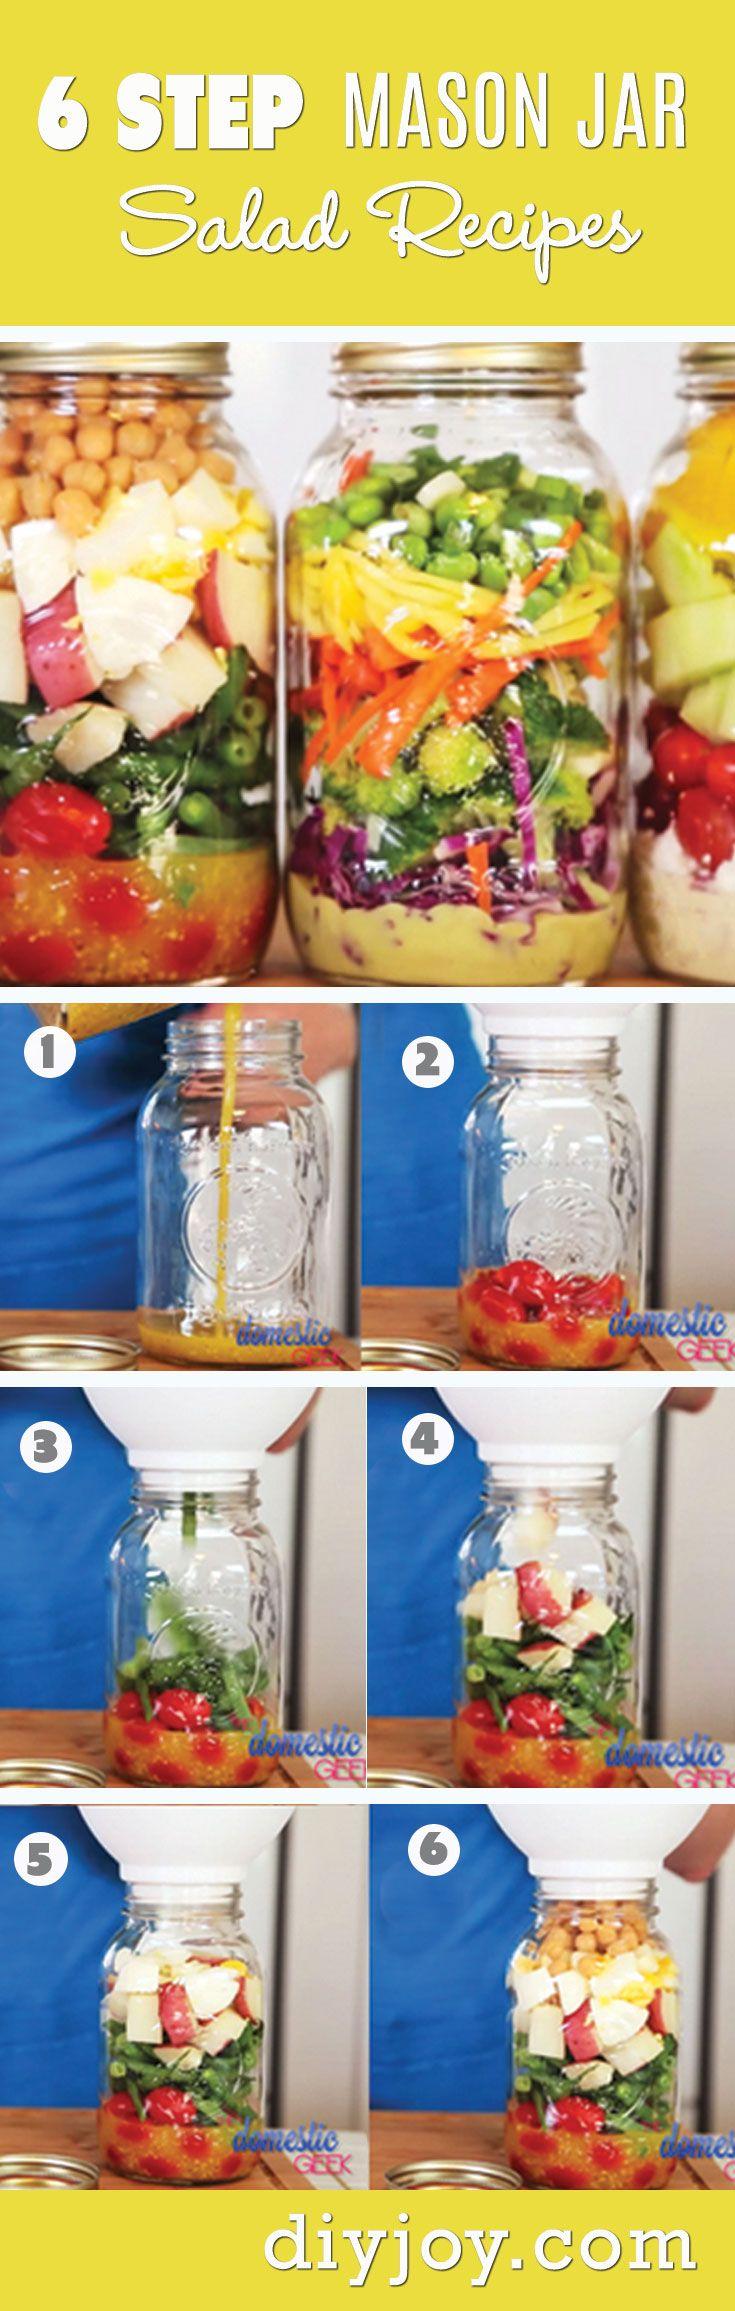 Mason Jar Salad Recipes - Recipes in A Jar and Easy Lunch Ideas at http://diyjoy.com/mason-jar-salad-recipes-in-a-jar